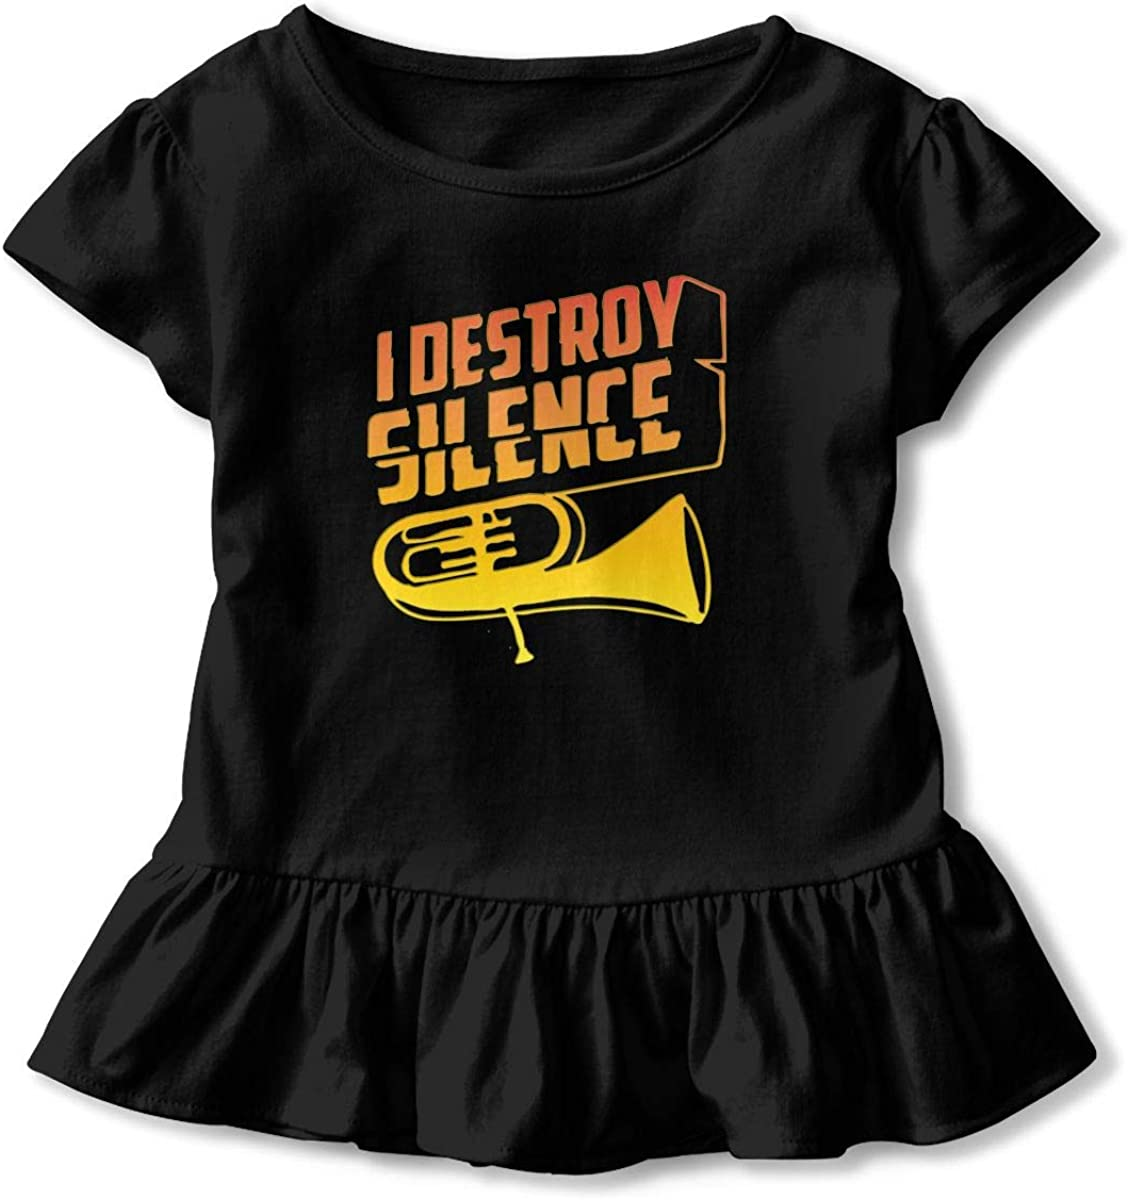 Cheng Jian Bo Gold I Destroy Silence Funny Tuba Player Toddler Girls T Shirt Kids Cotton Short Sleeve Ruffle Tee